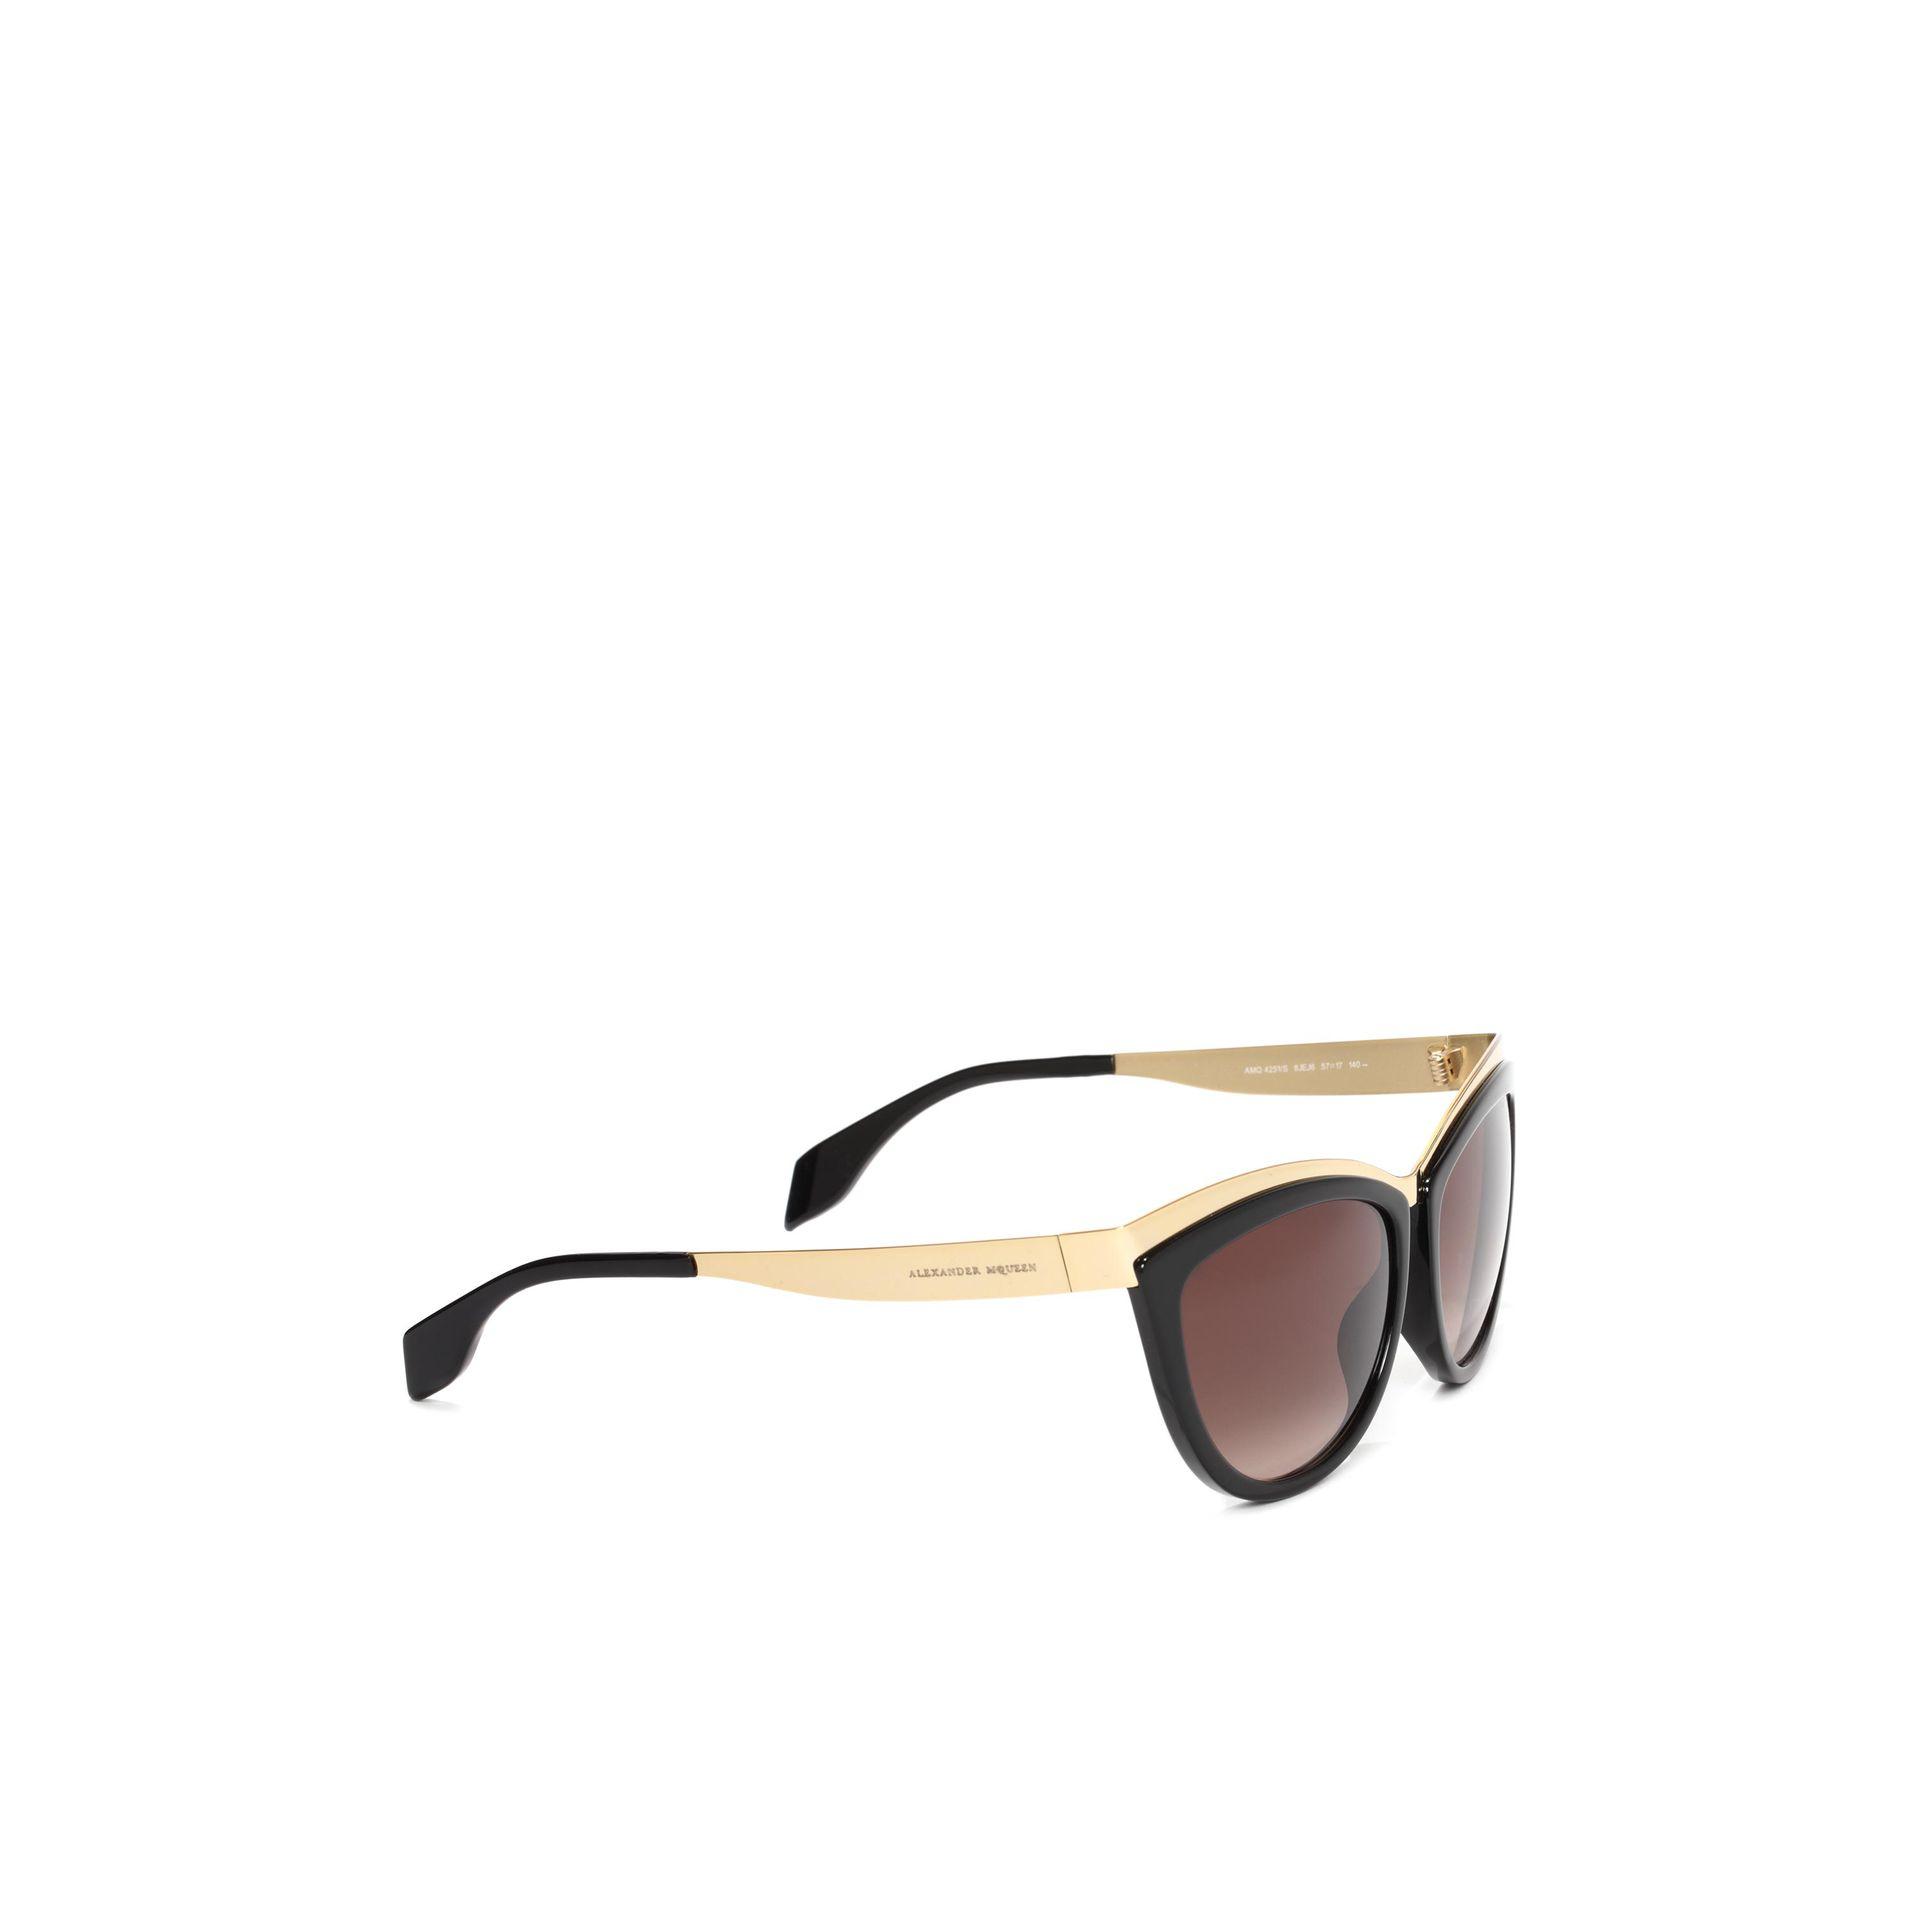 33f0ae0f8cc Lyst - Alexander McQueen Metal Brow Cat Eye Sunglasses in Metallic ...